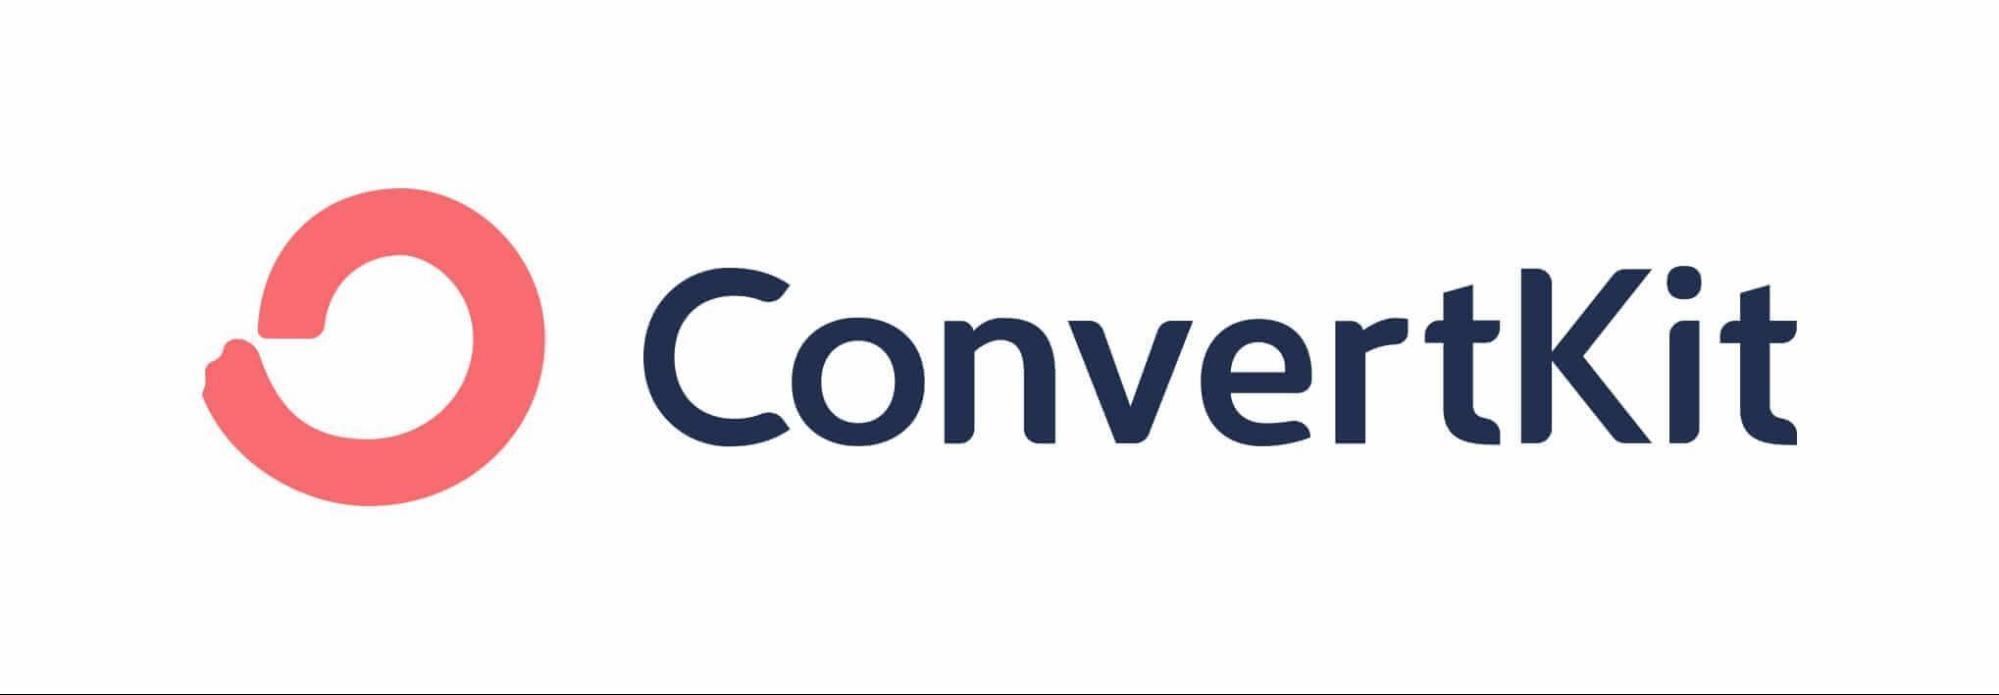 ConvertKit's logo